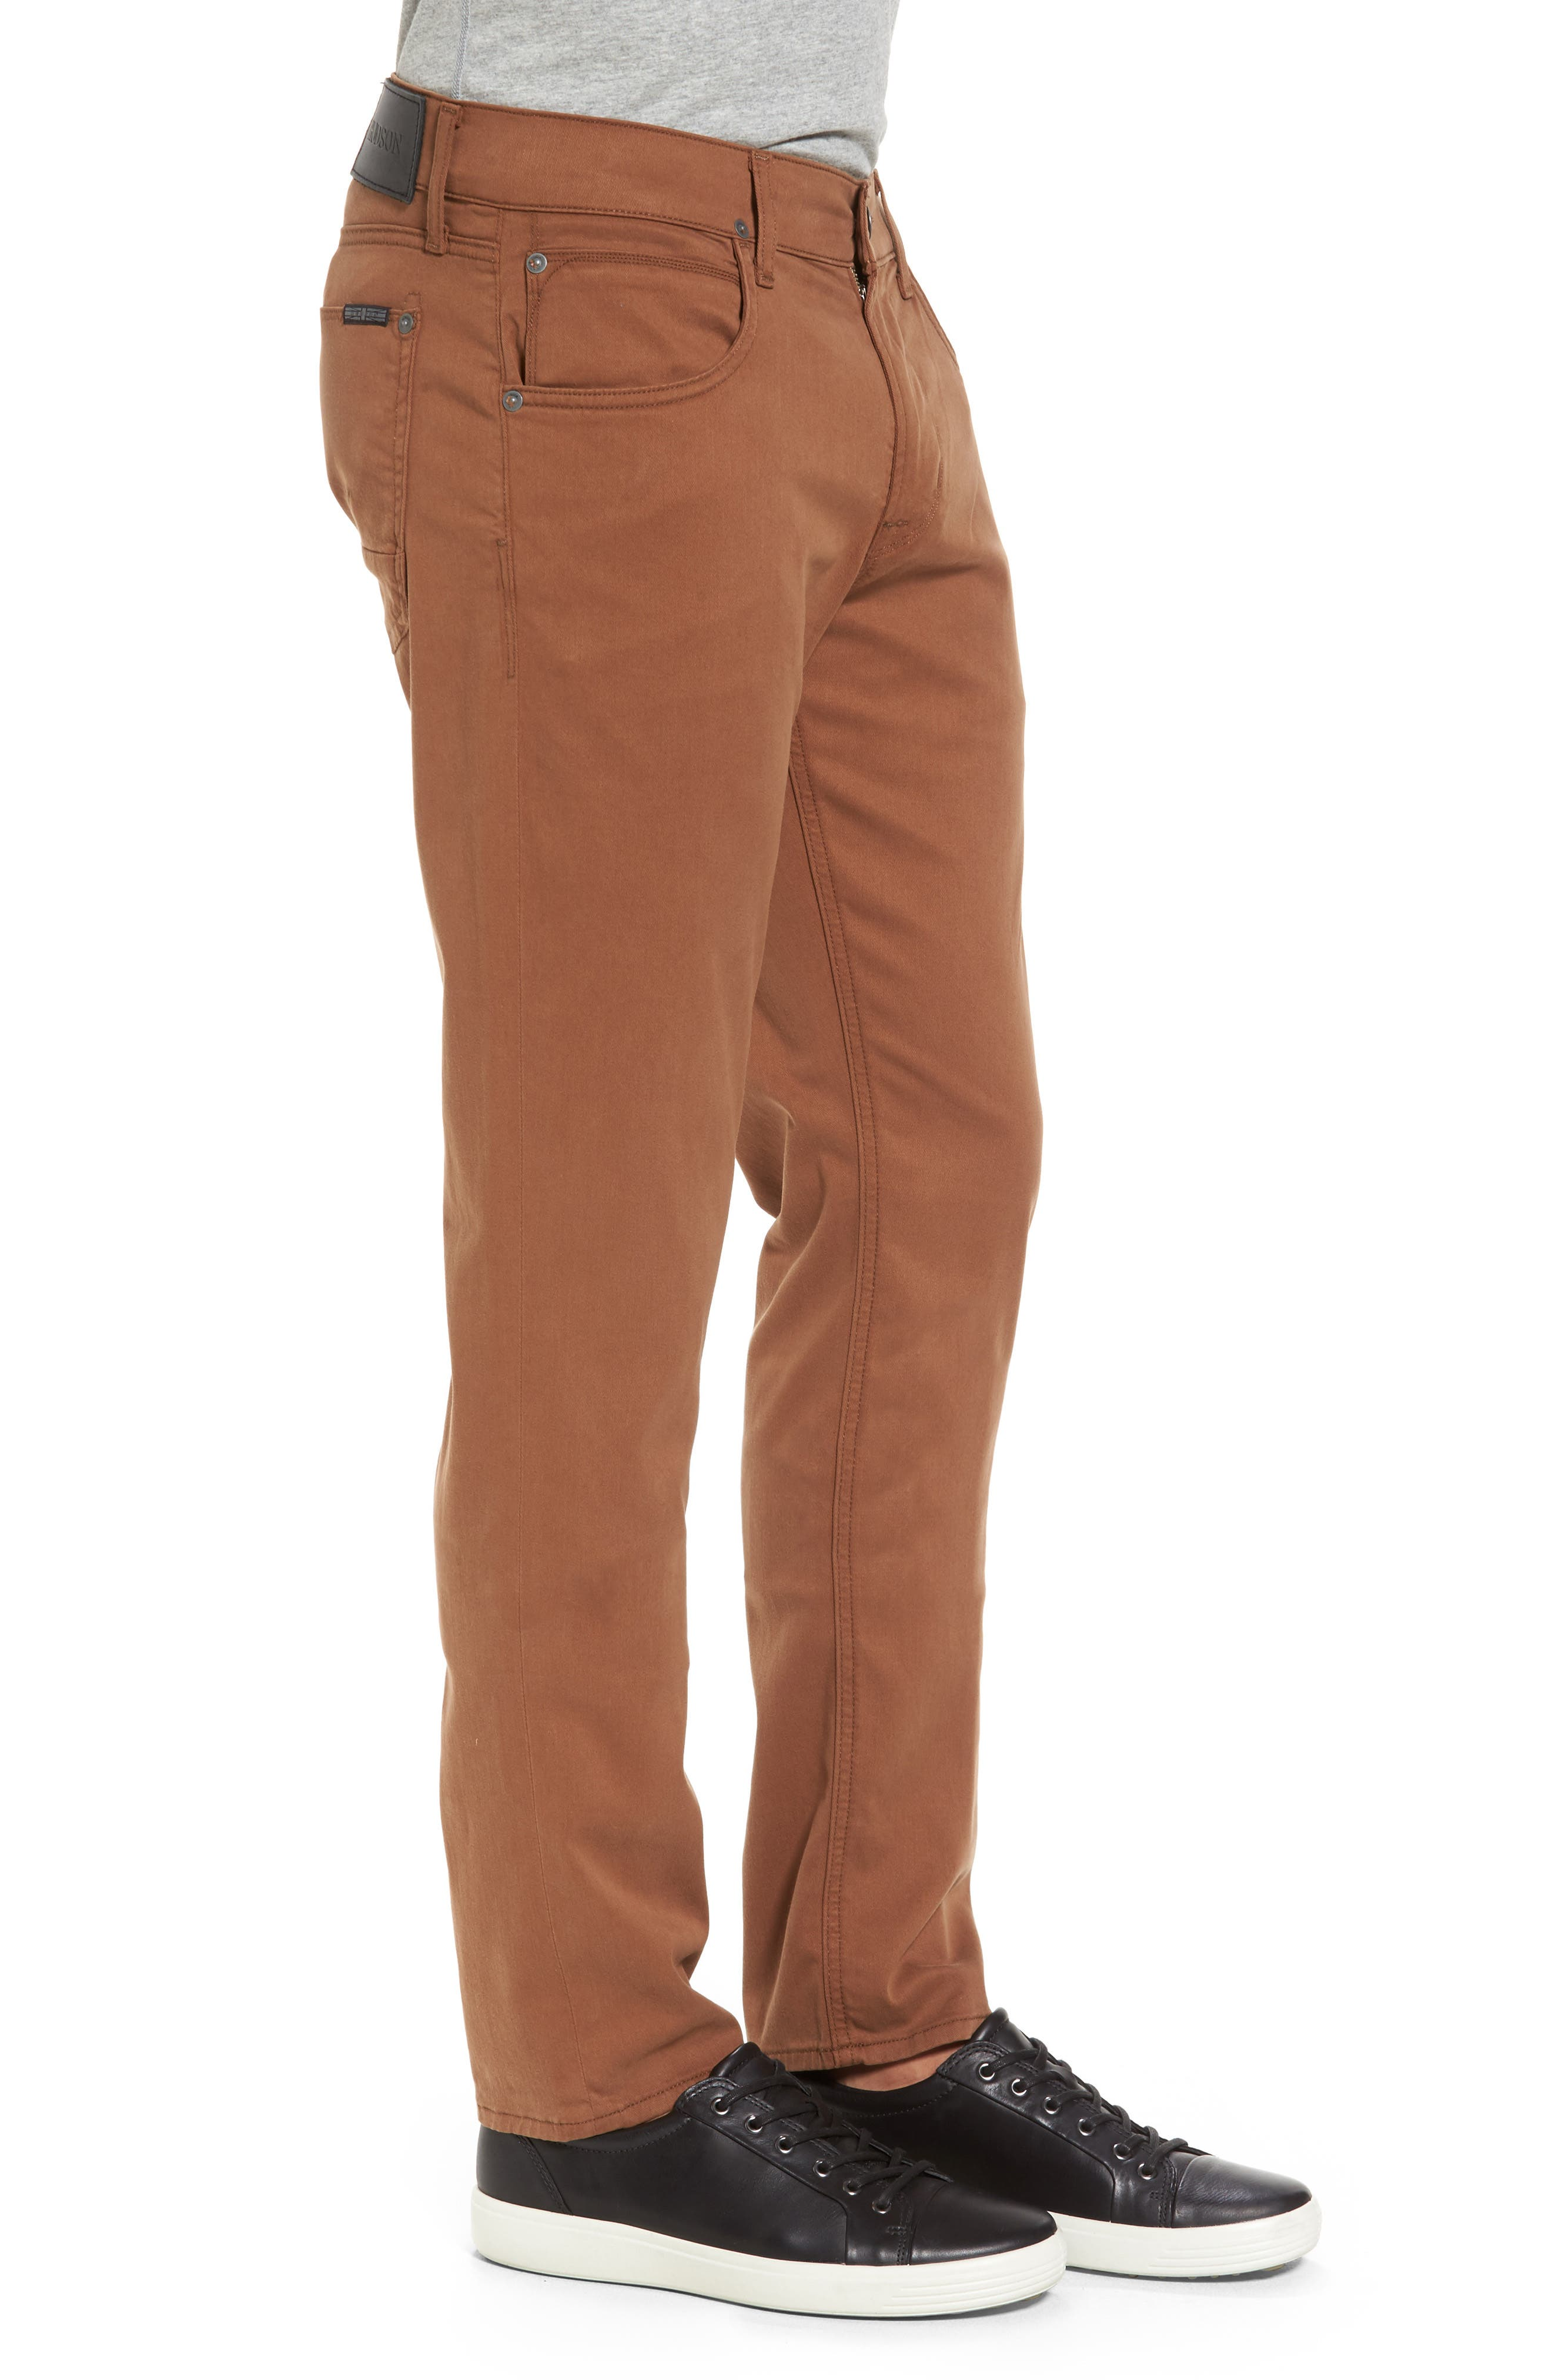 Blake Slim Fit Jeans,                             Alternate thumbnail 3, color,                             Masonite